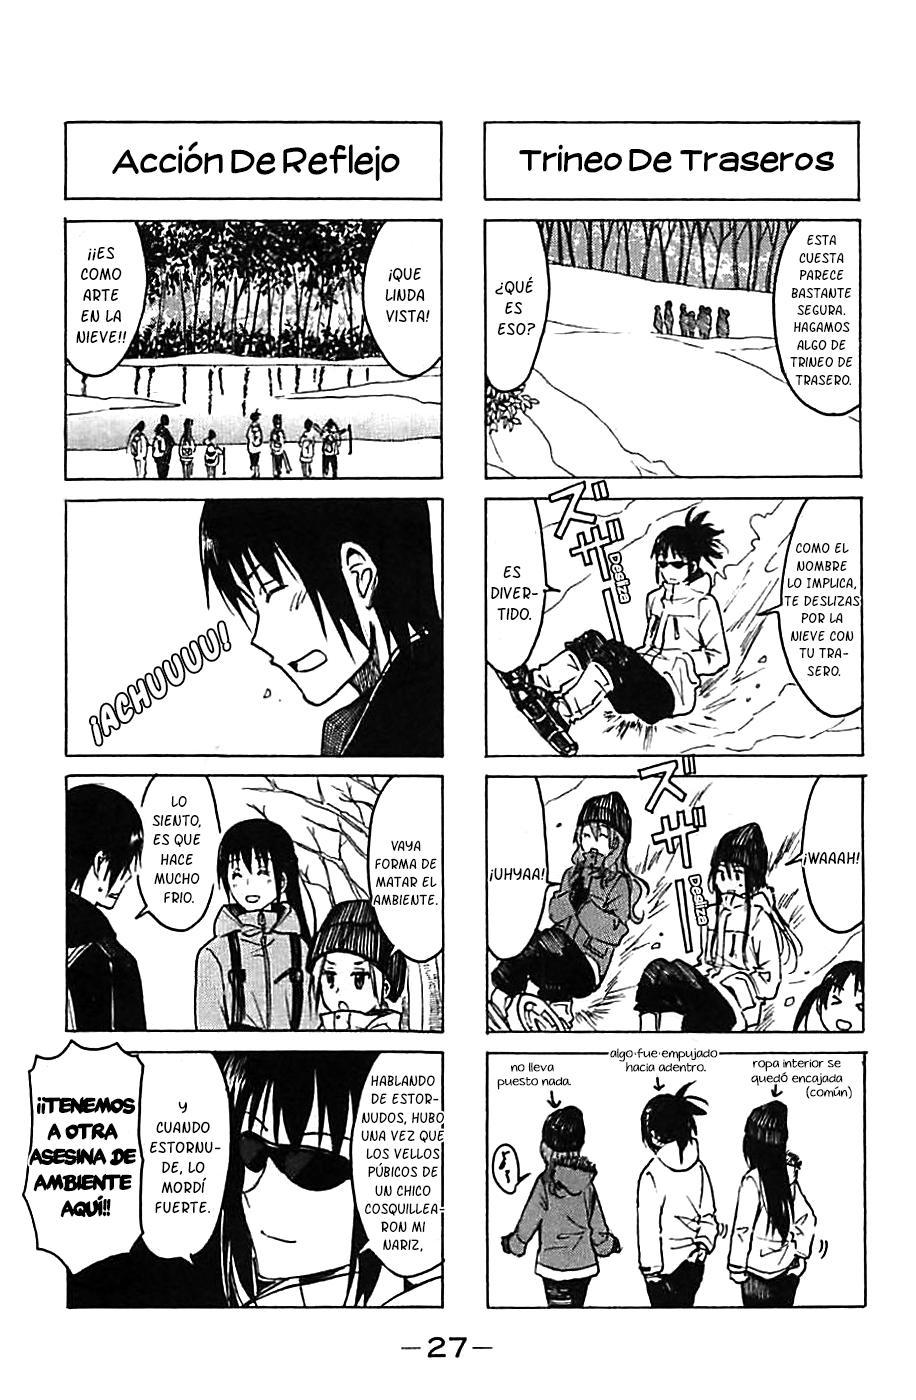 http://c5.ninemanga.com/es_manga/2/17602/412439/cdfc98d231a27426af33906c0a12d319.jpg Page 4